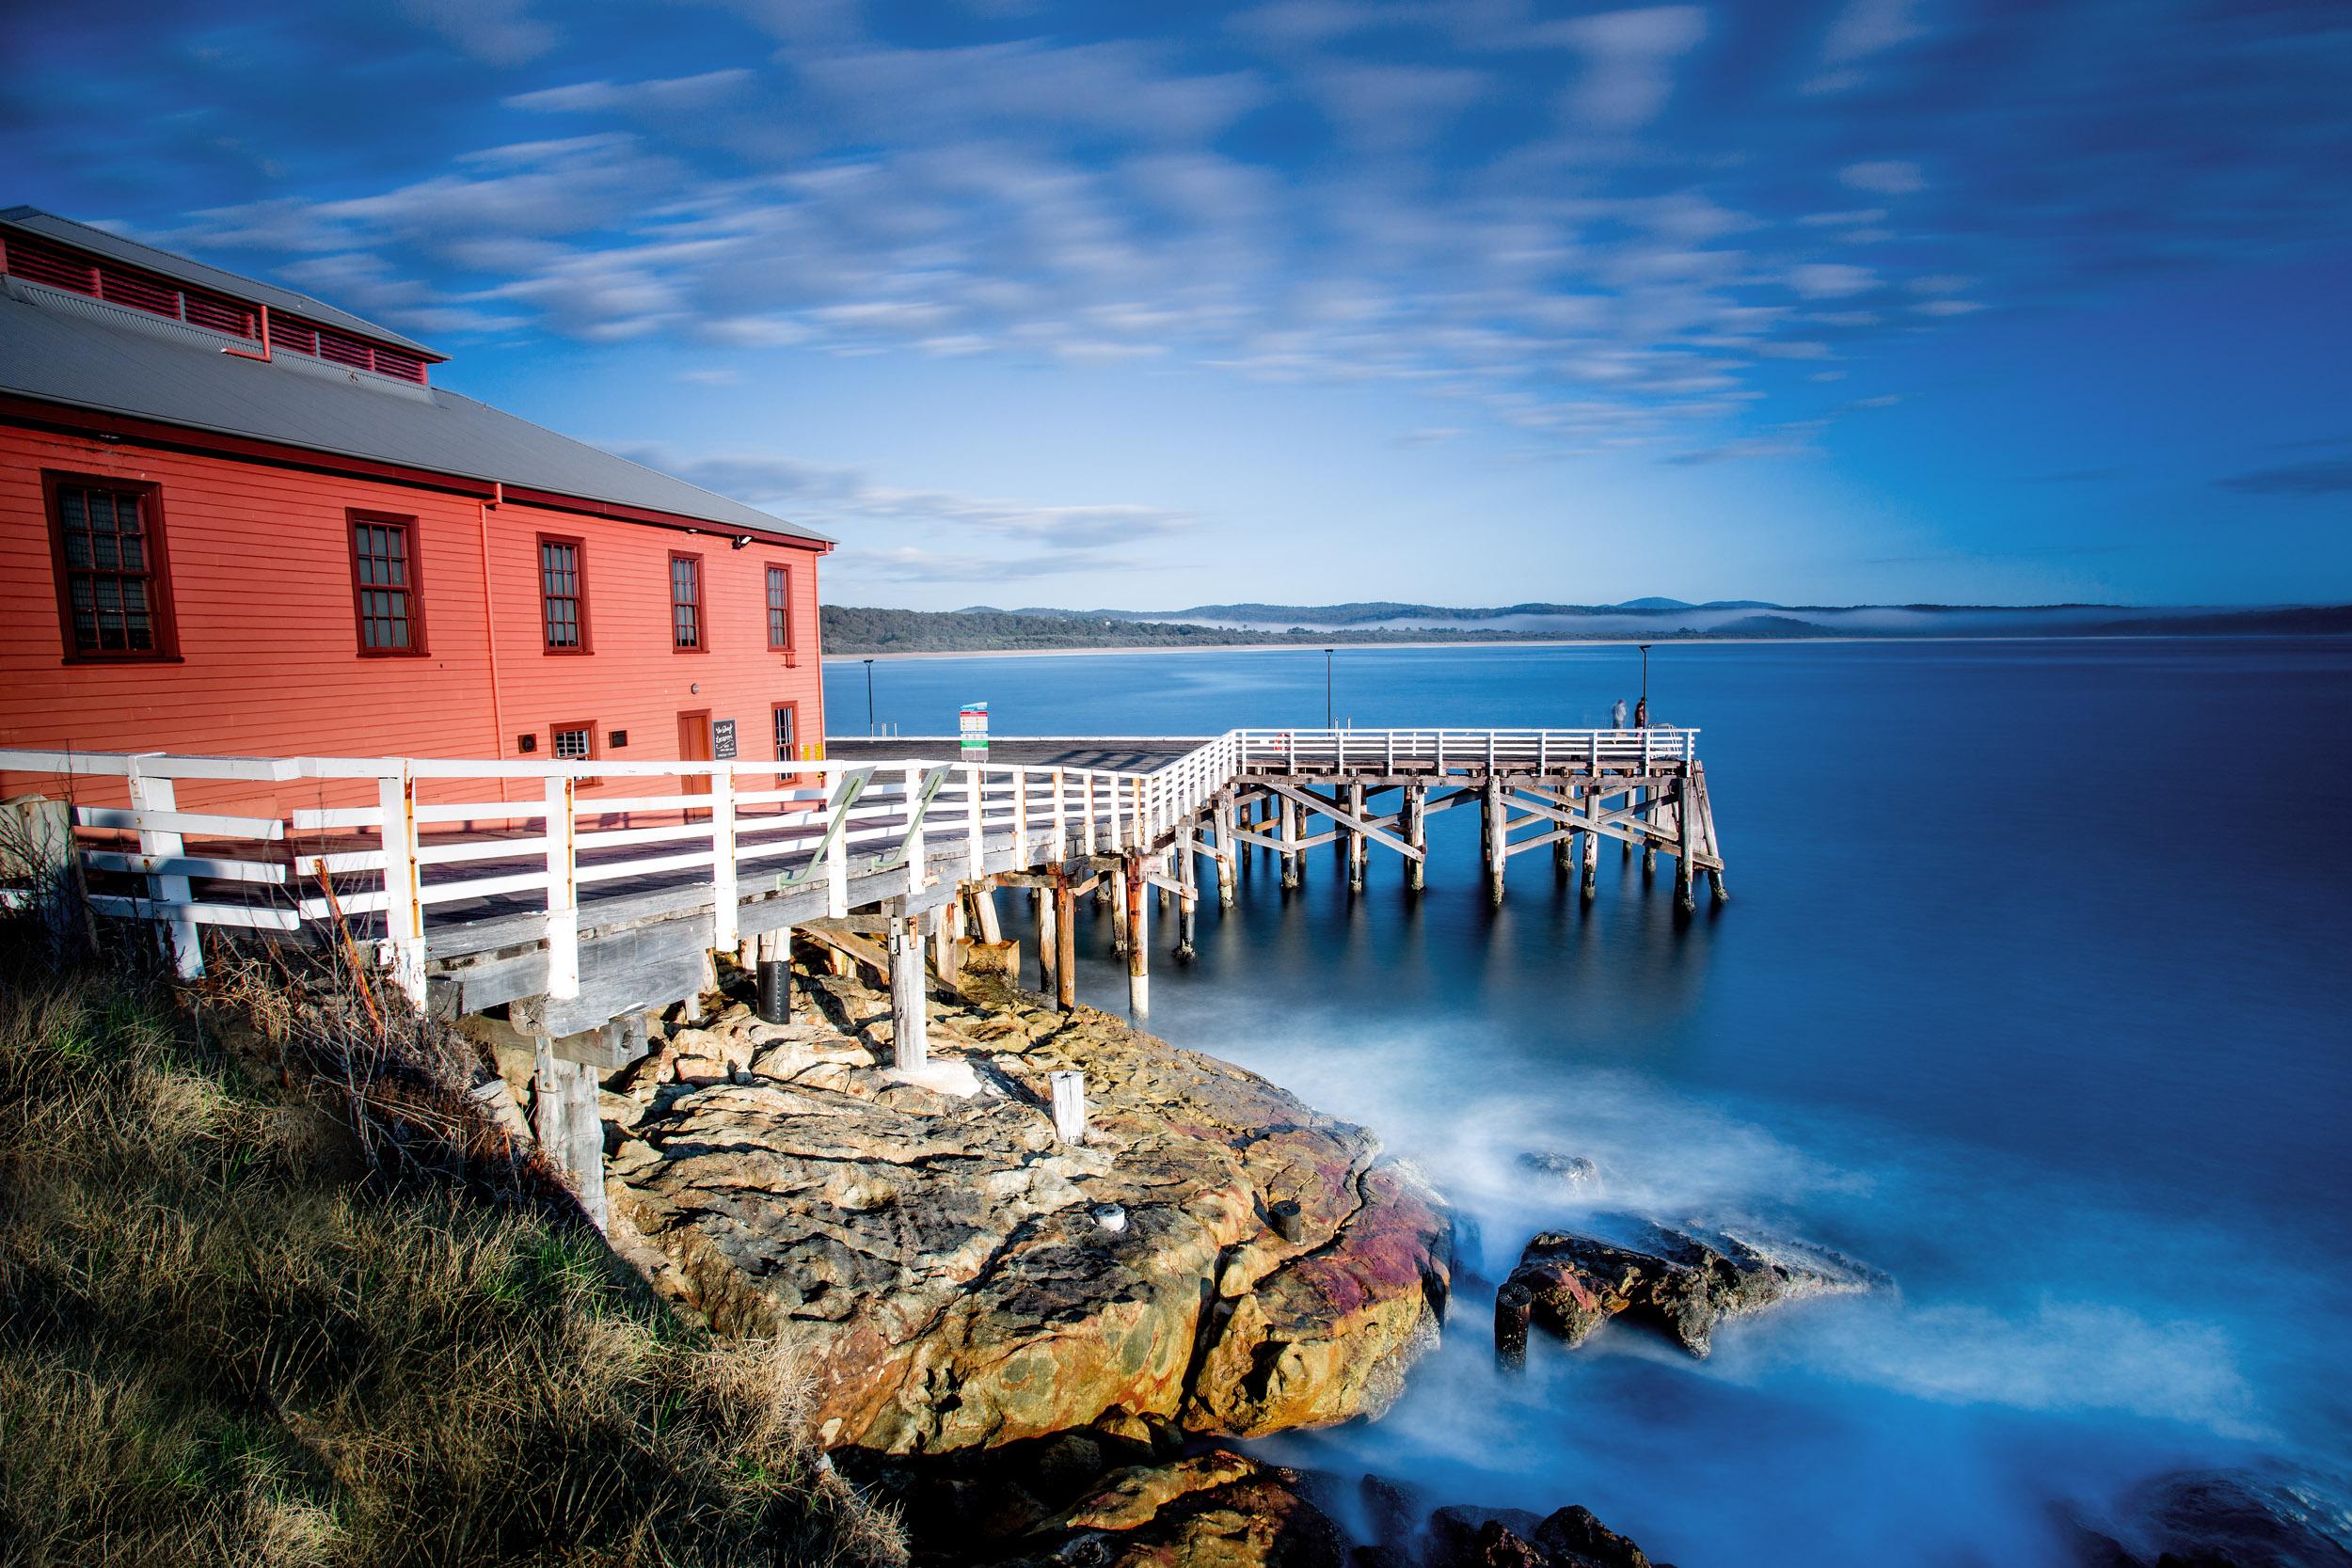 tathra-wharf-south-coast-nsw.jpg